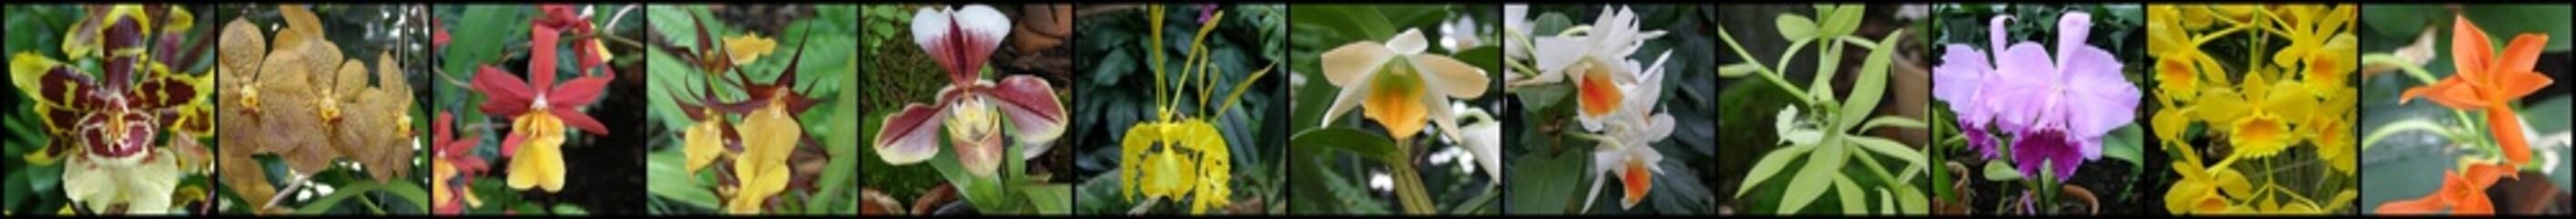 Fototapeta Orchidea i storczyk